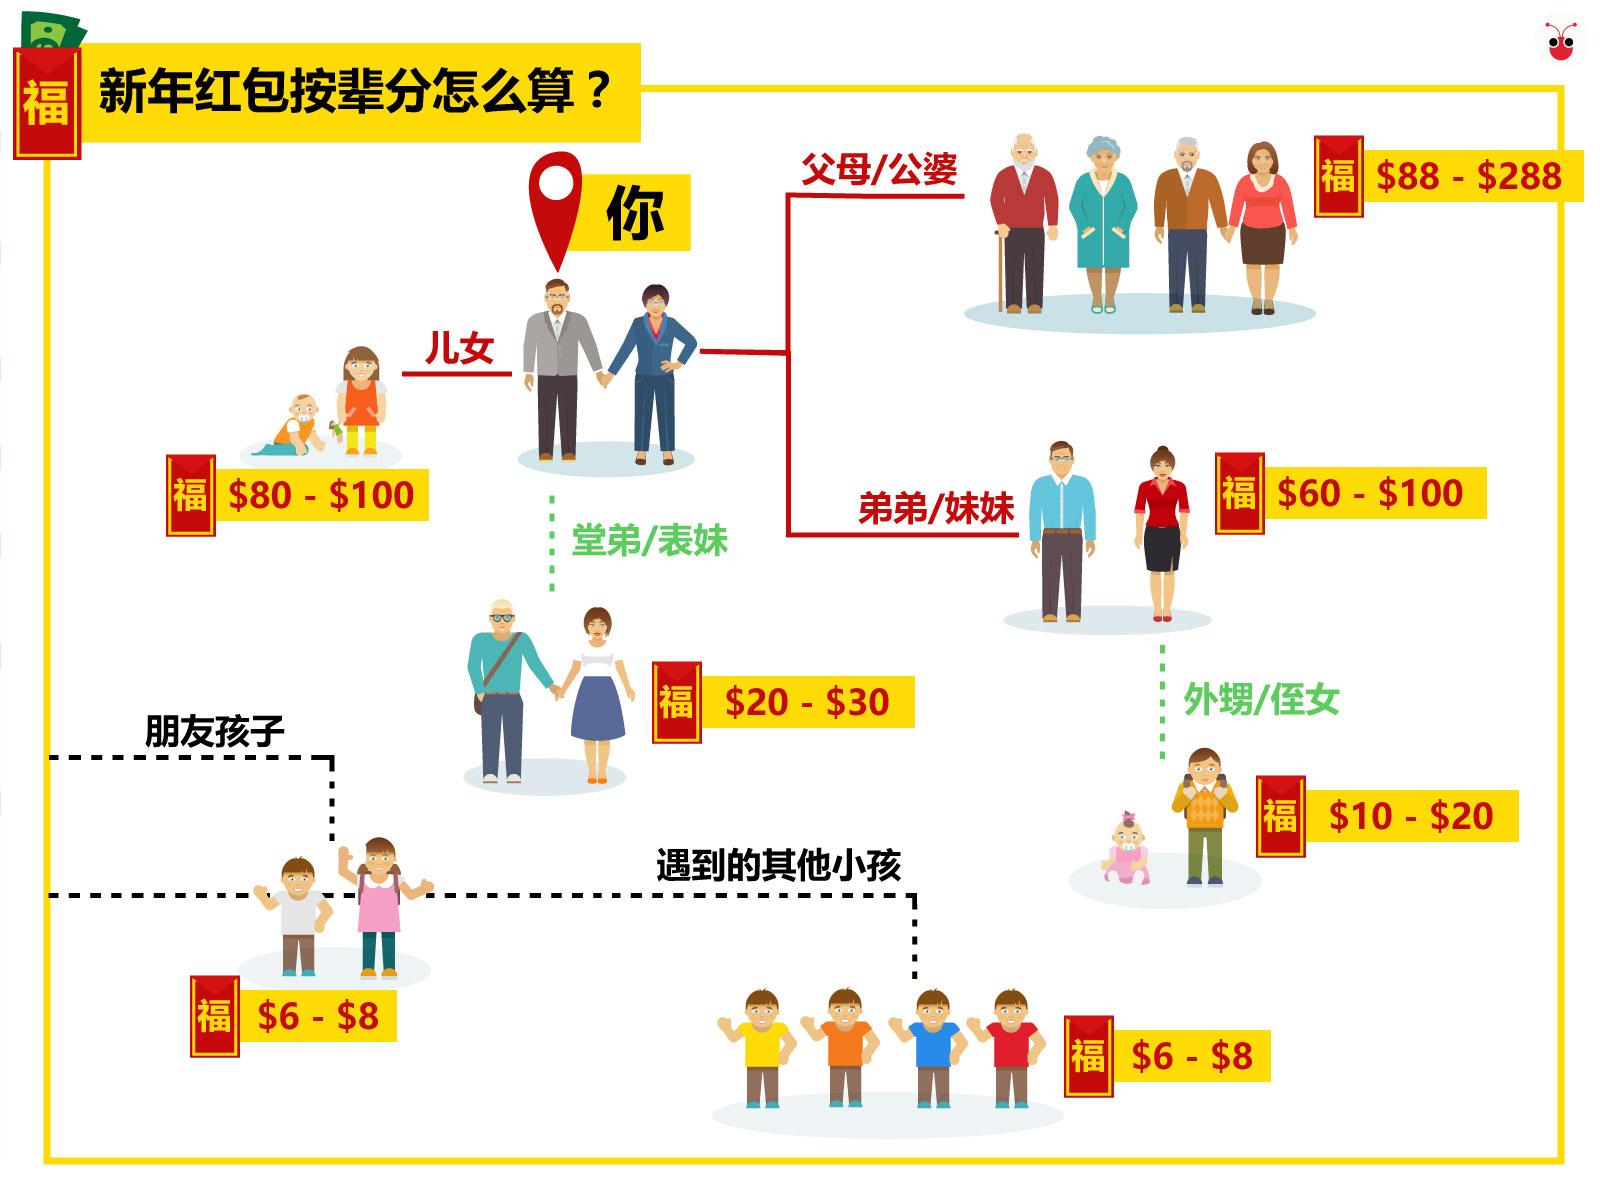 20180213_hongbao.jpg